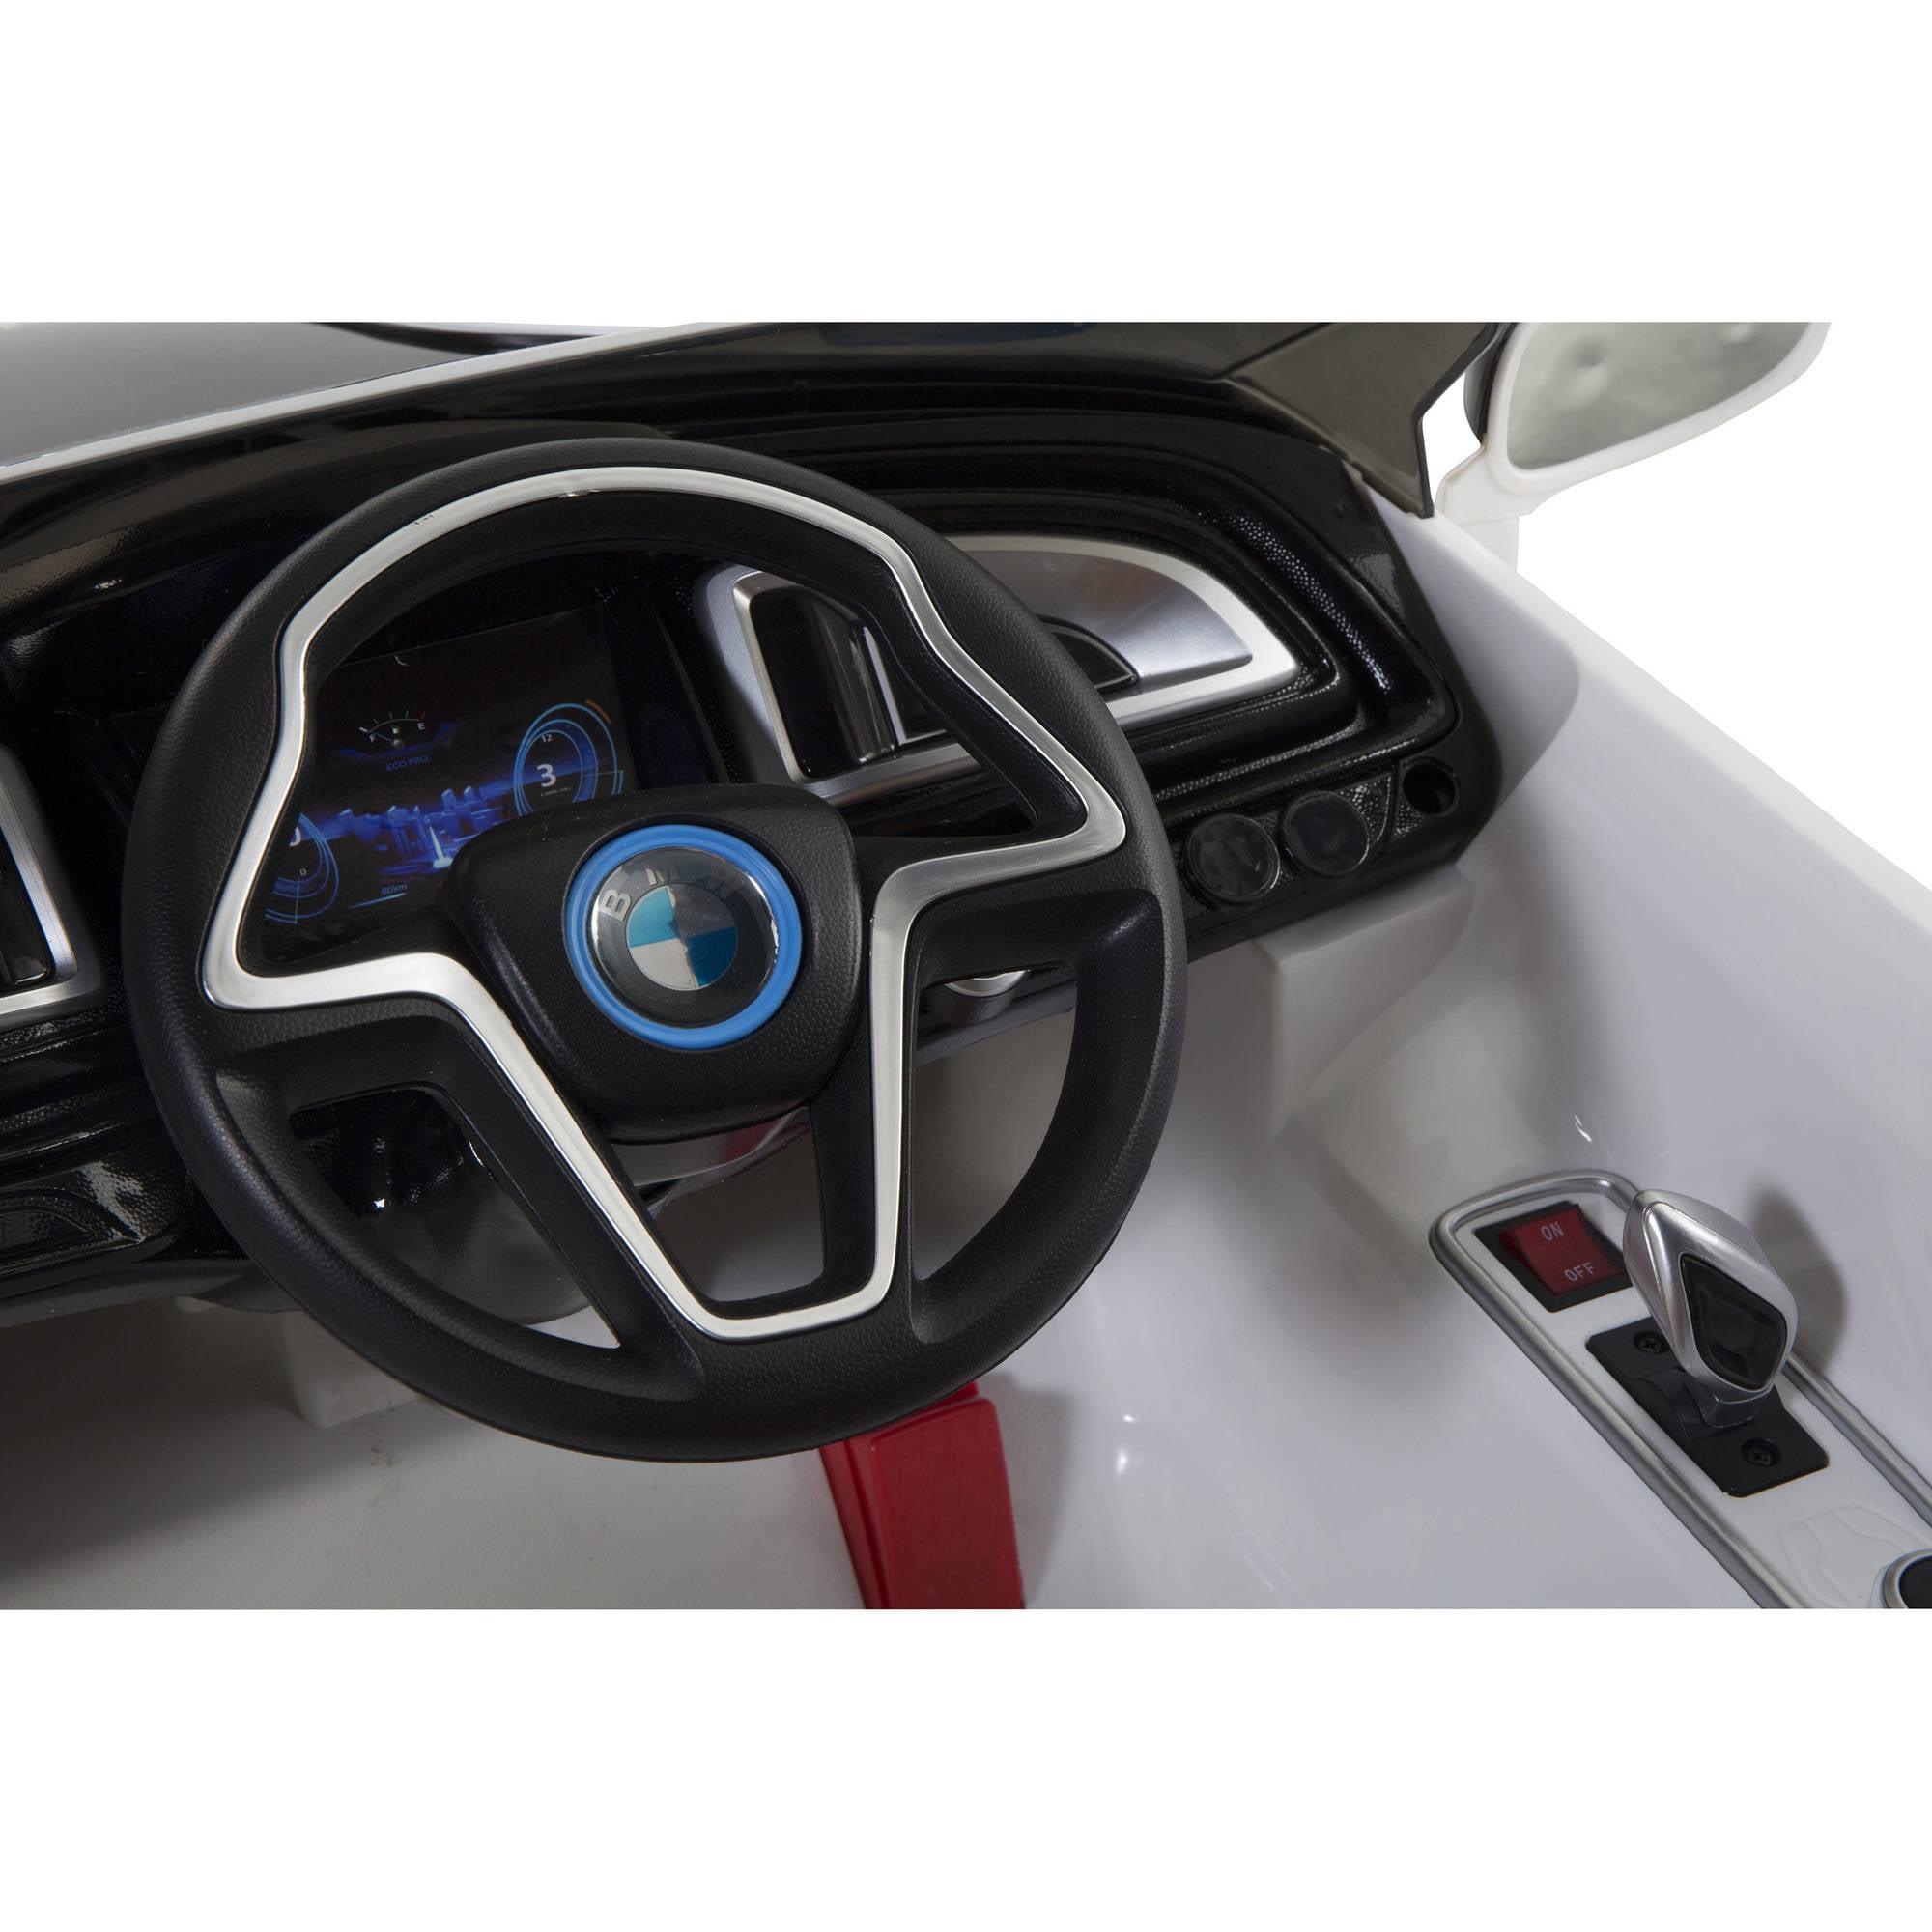 bmw i8 concept car 6 volt battery powered ride on walmartcom